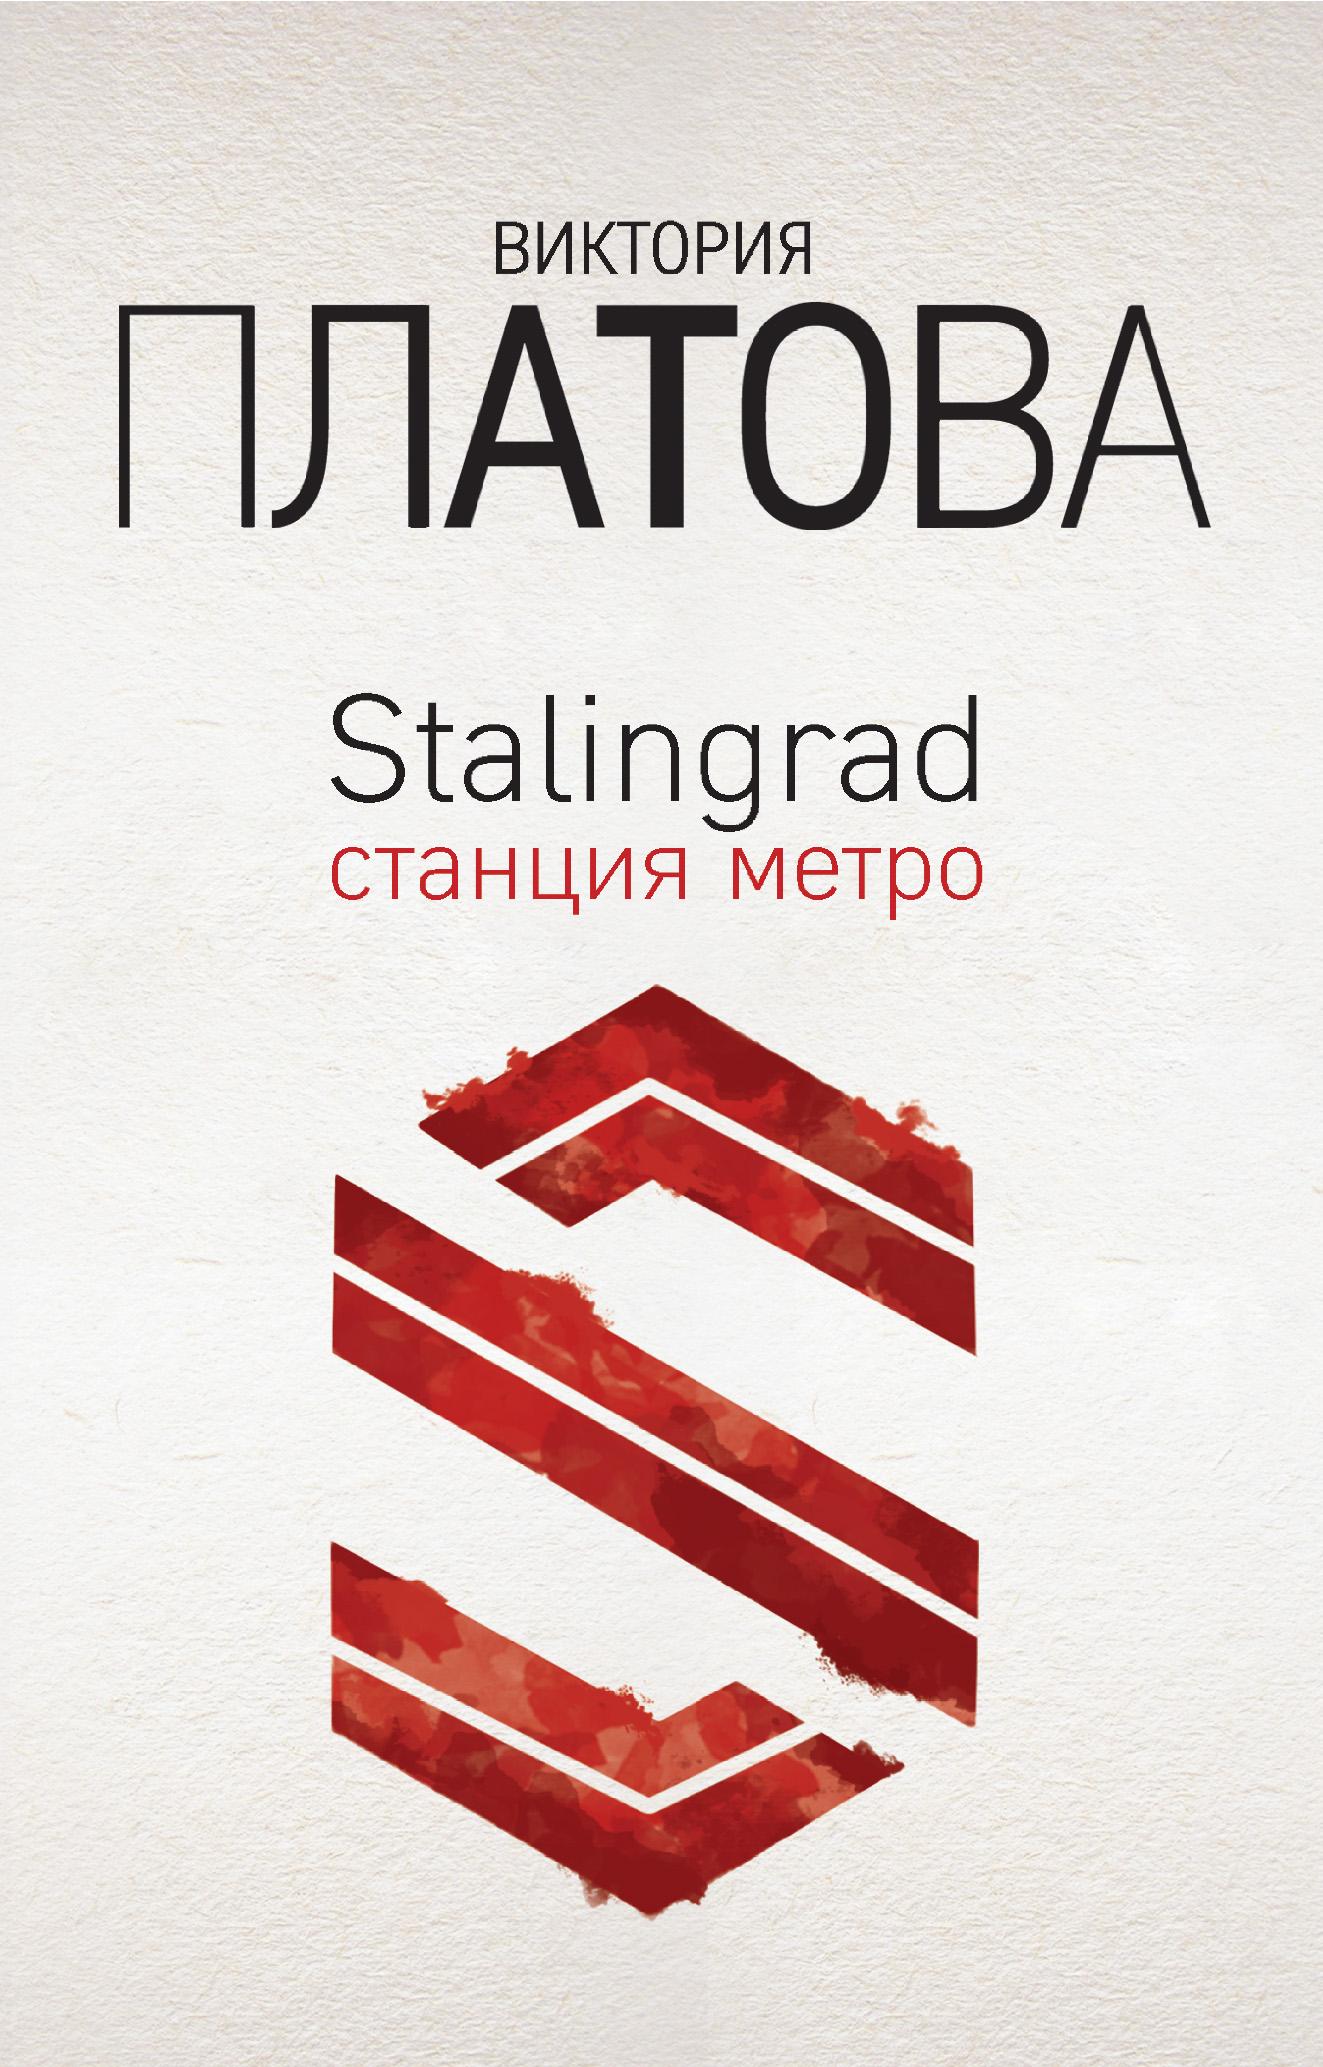 Stalingrad, станция метро